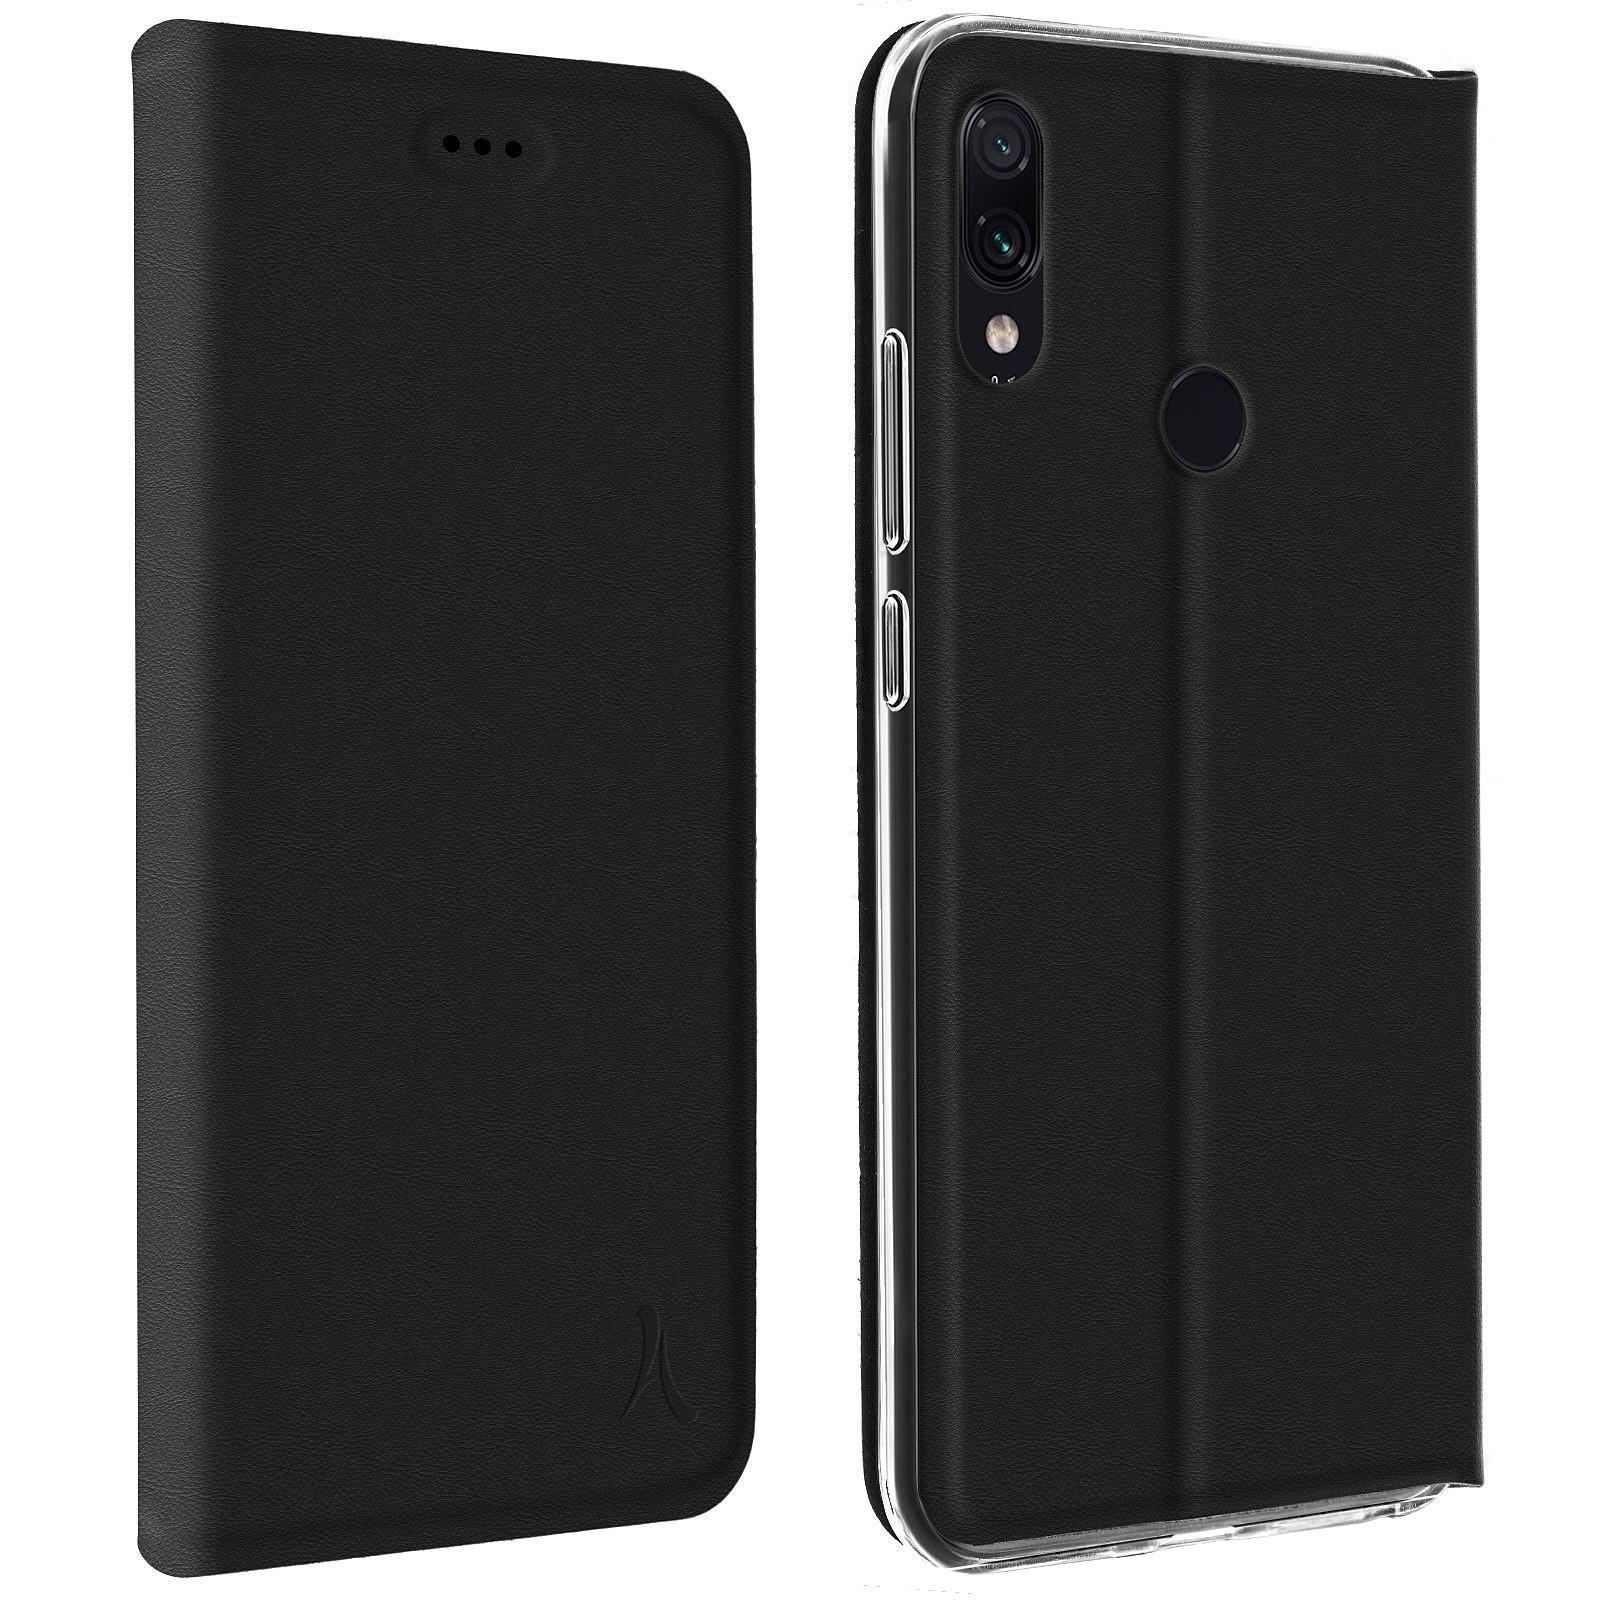 Akashi Etui Folio Porte Carte Noir Xiaomi Redmi Note 7